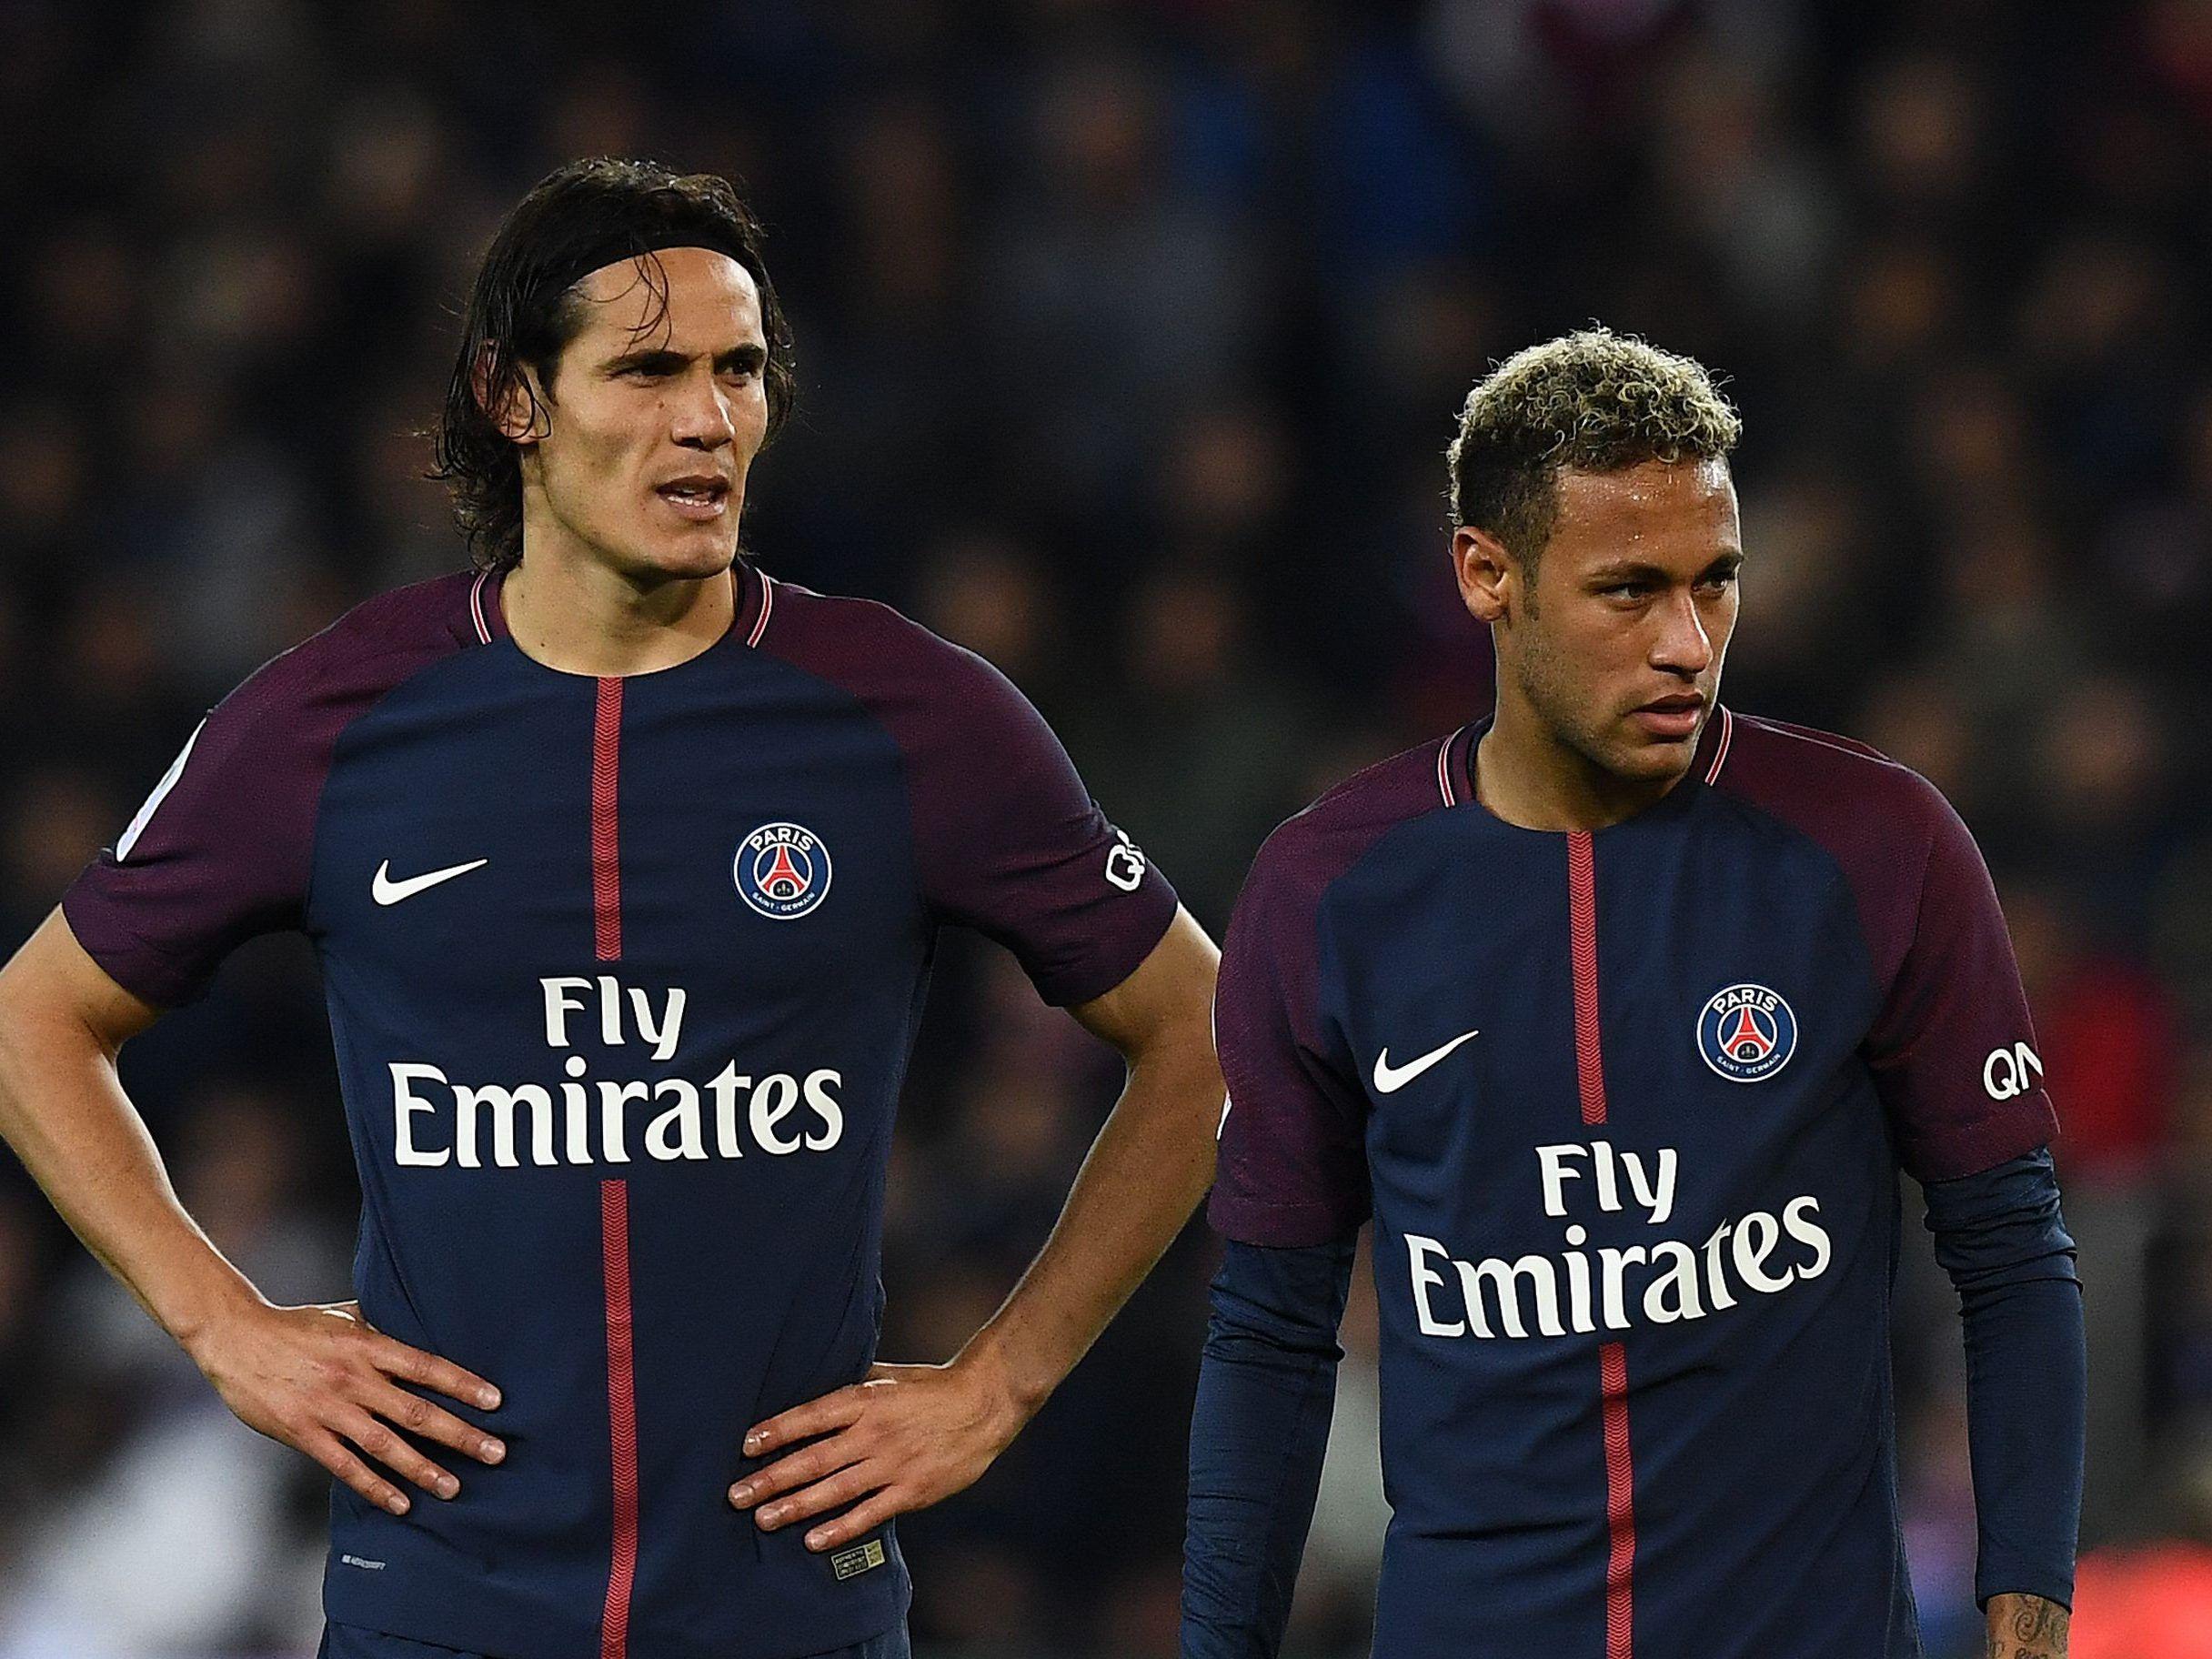 Paris St Germain Psg Gegen Bayern München Fcb Live Stream Tv